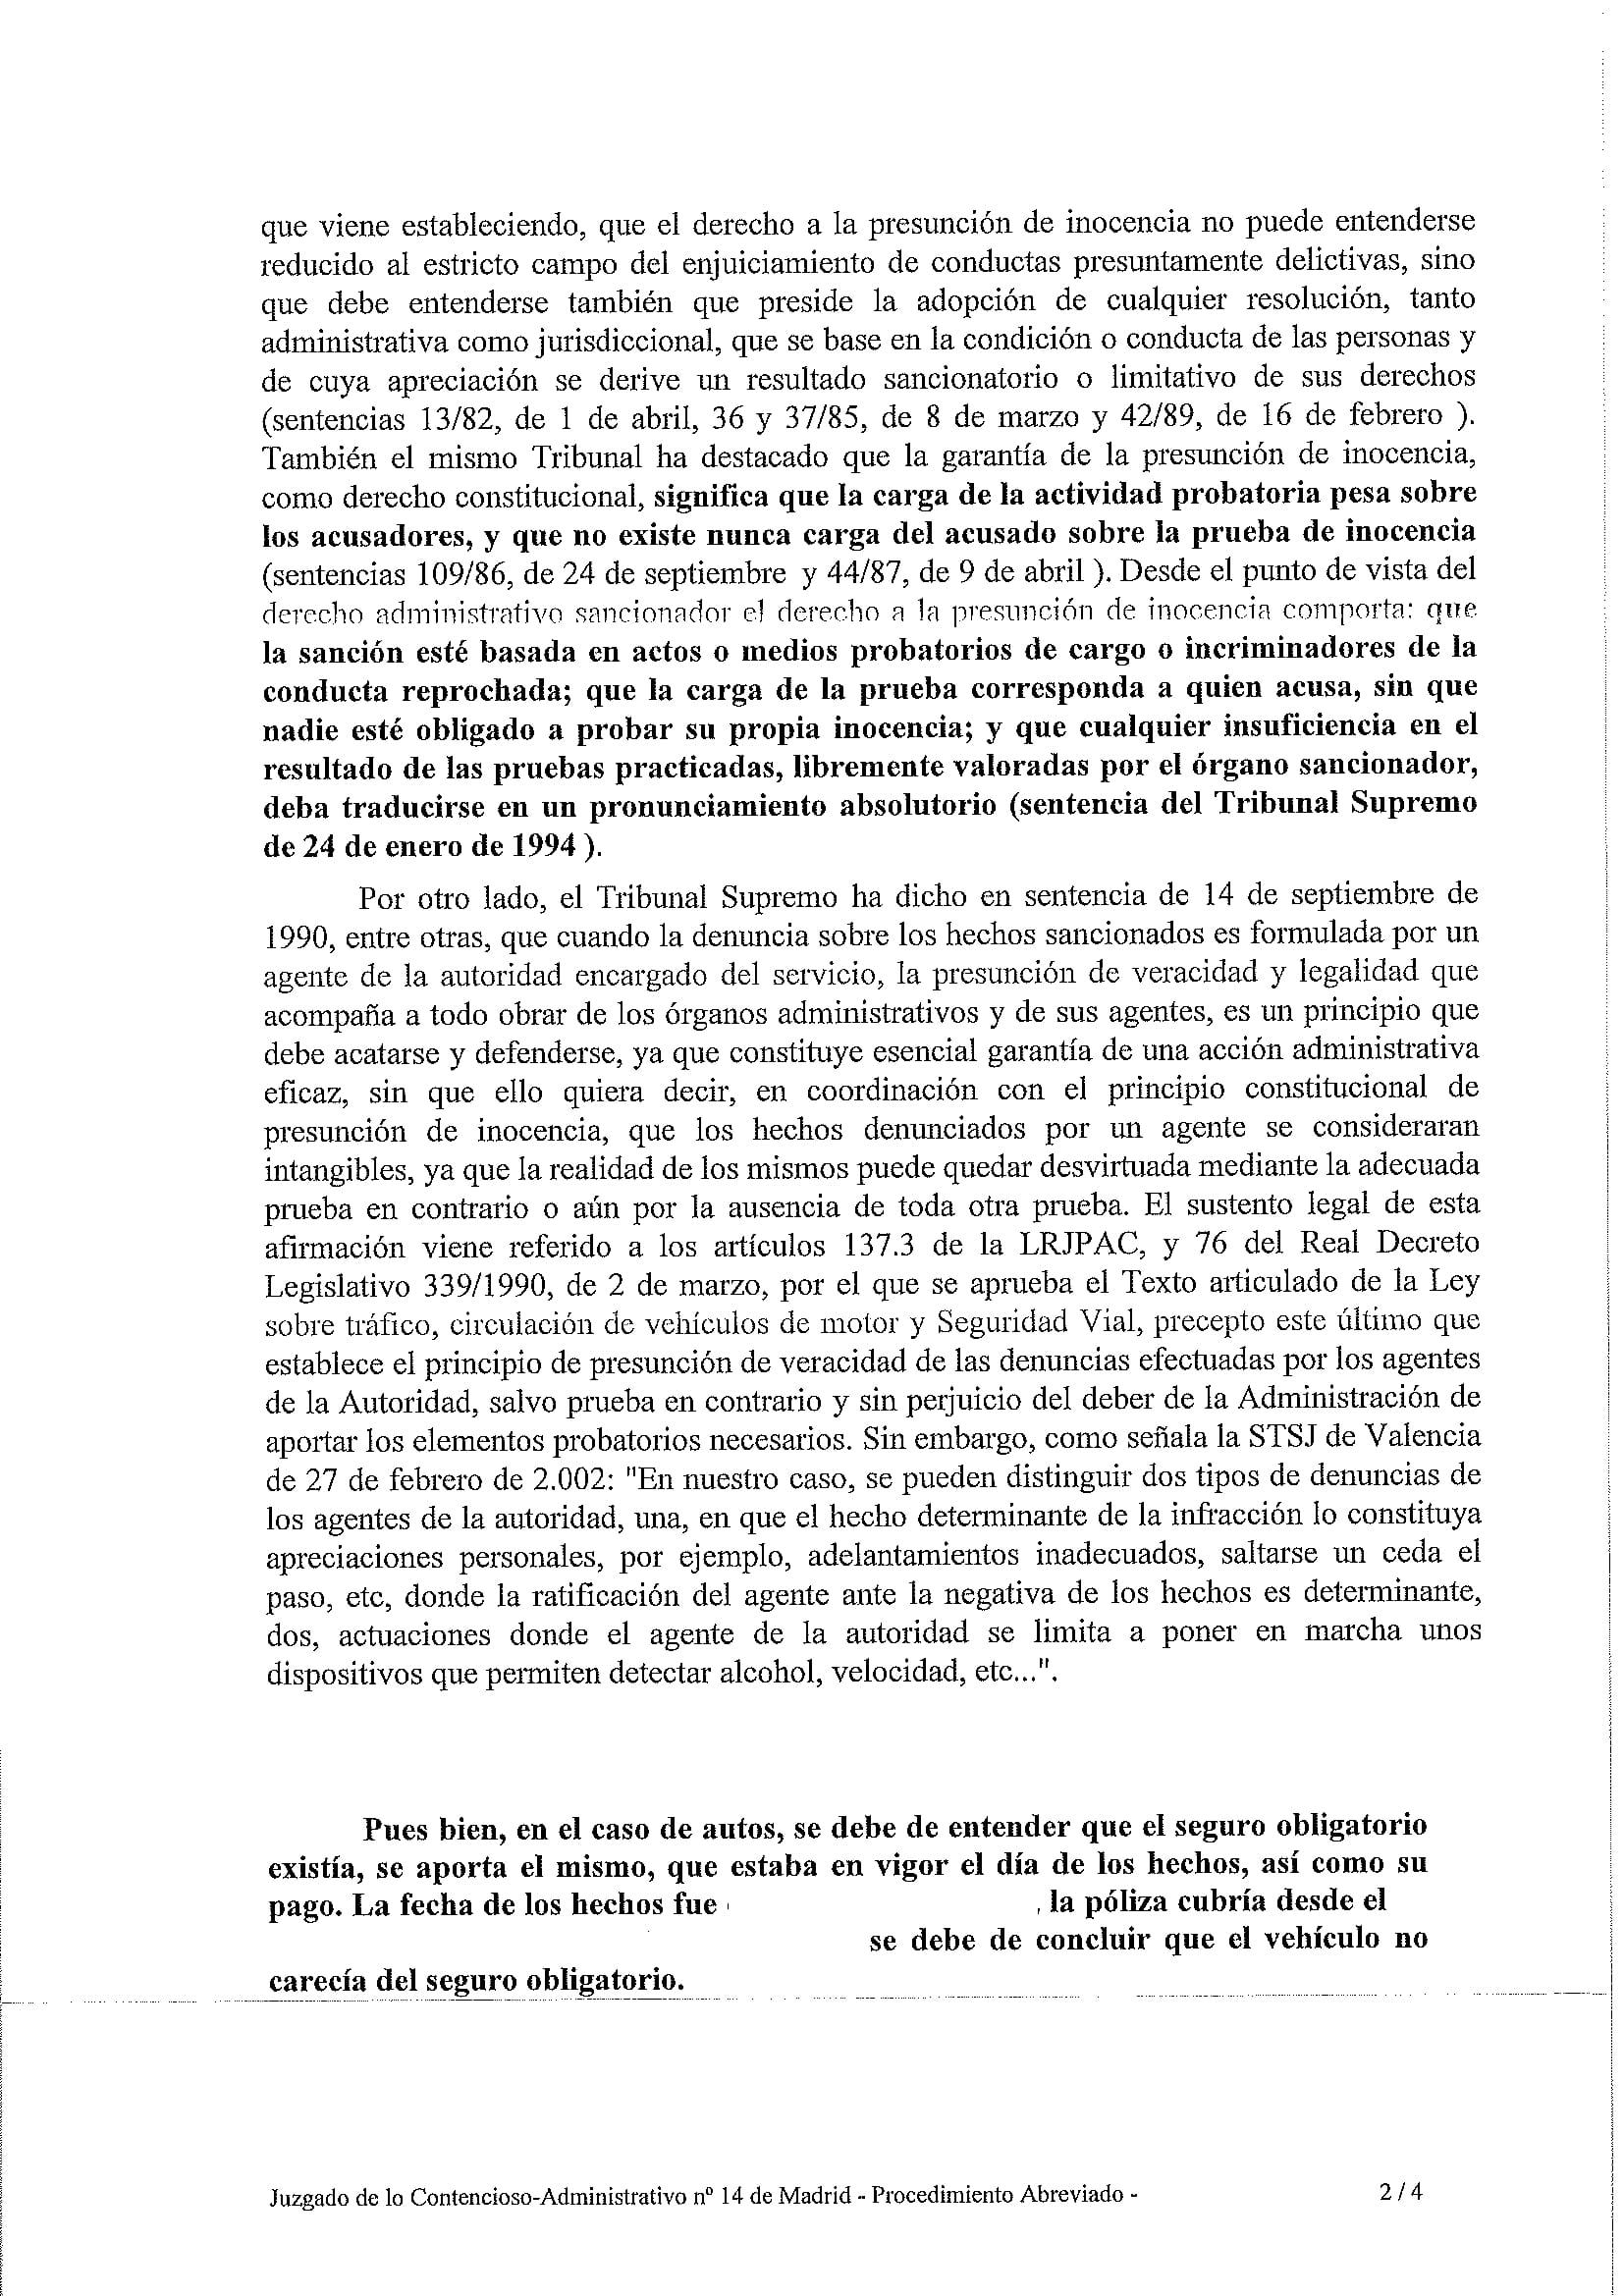 190521-seguro-2